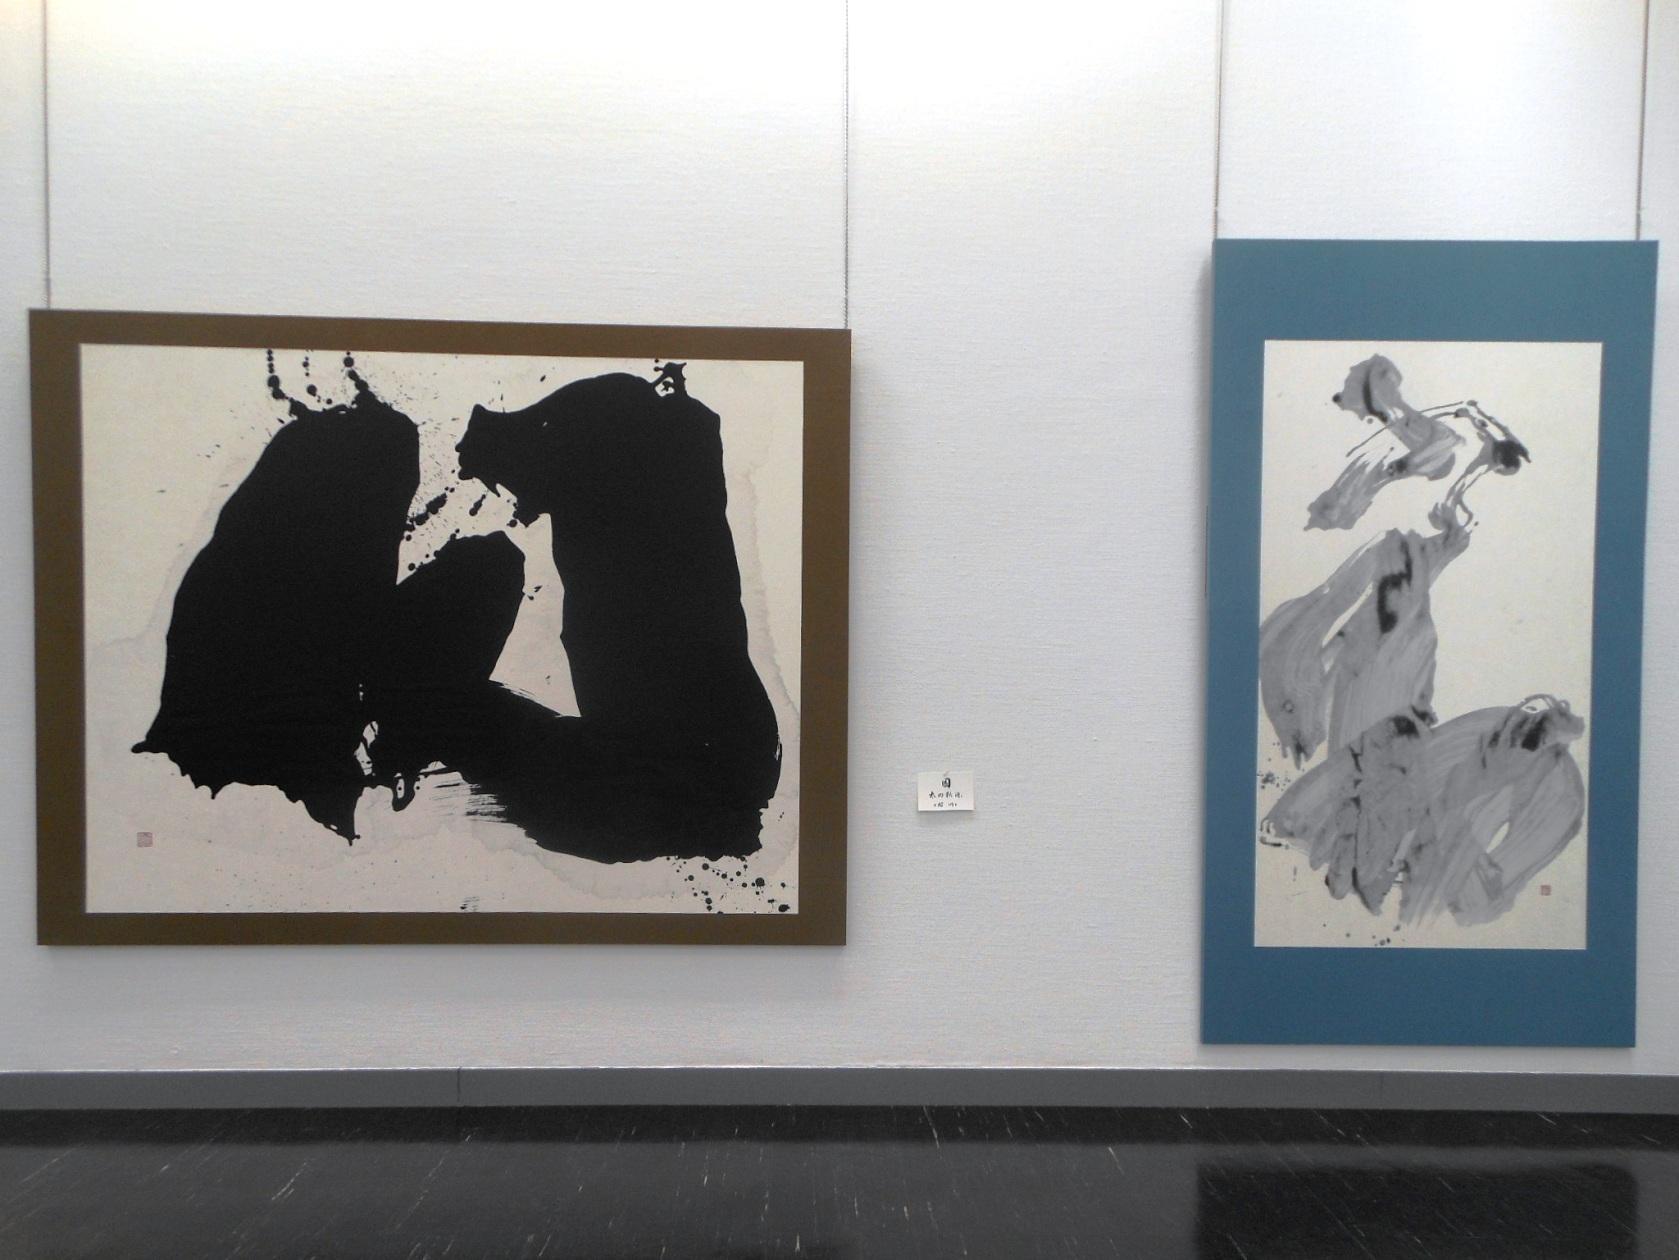 1690)「第26回 北海道墨人展」 市民ギャラリー 4月4日(水)~4月8日(日) _f0126829_15114489.jpg